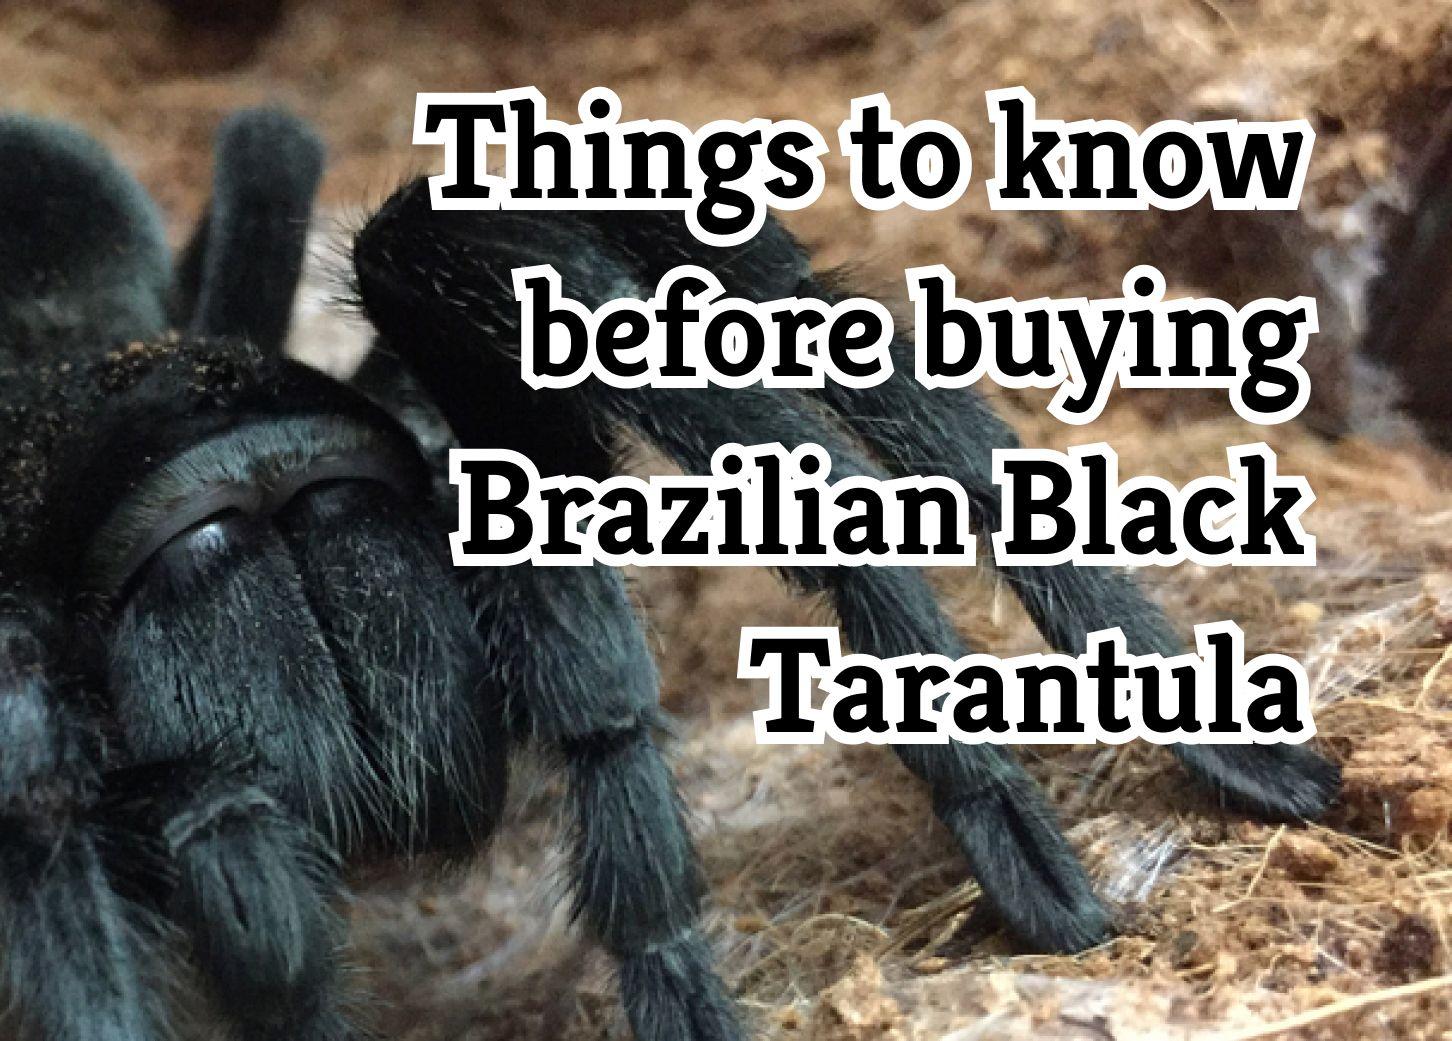 Things to consider before getting a Brazilian Black Tarantula